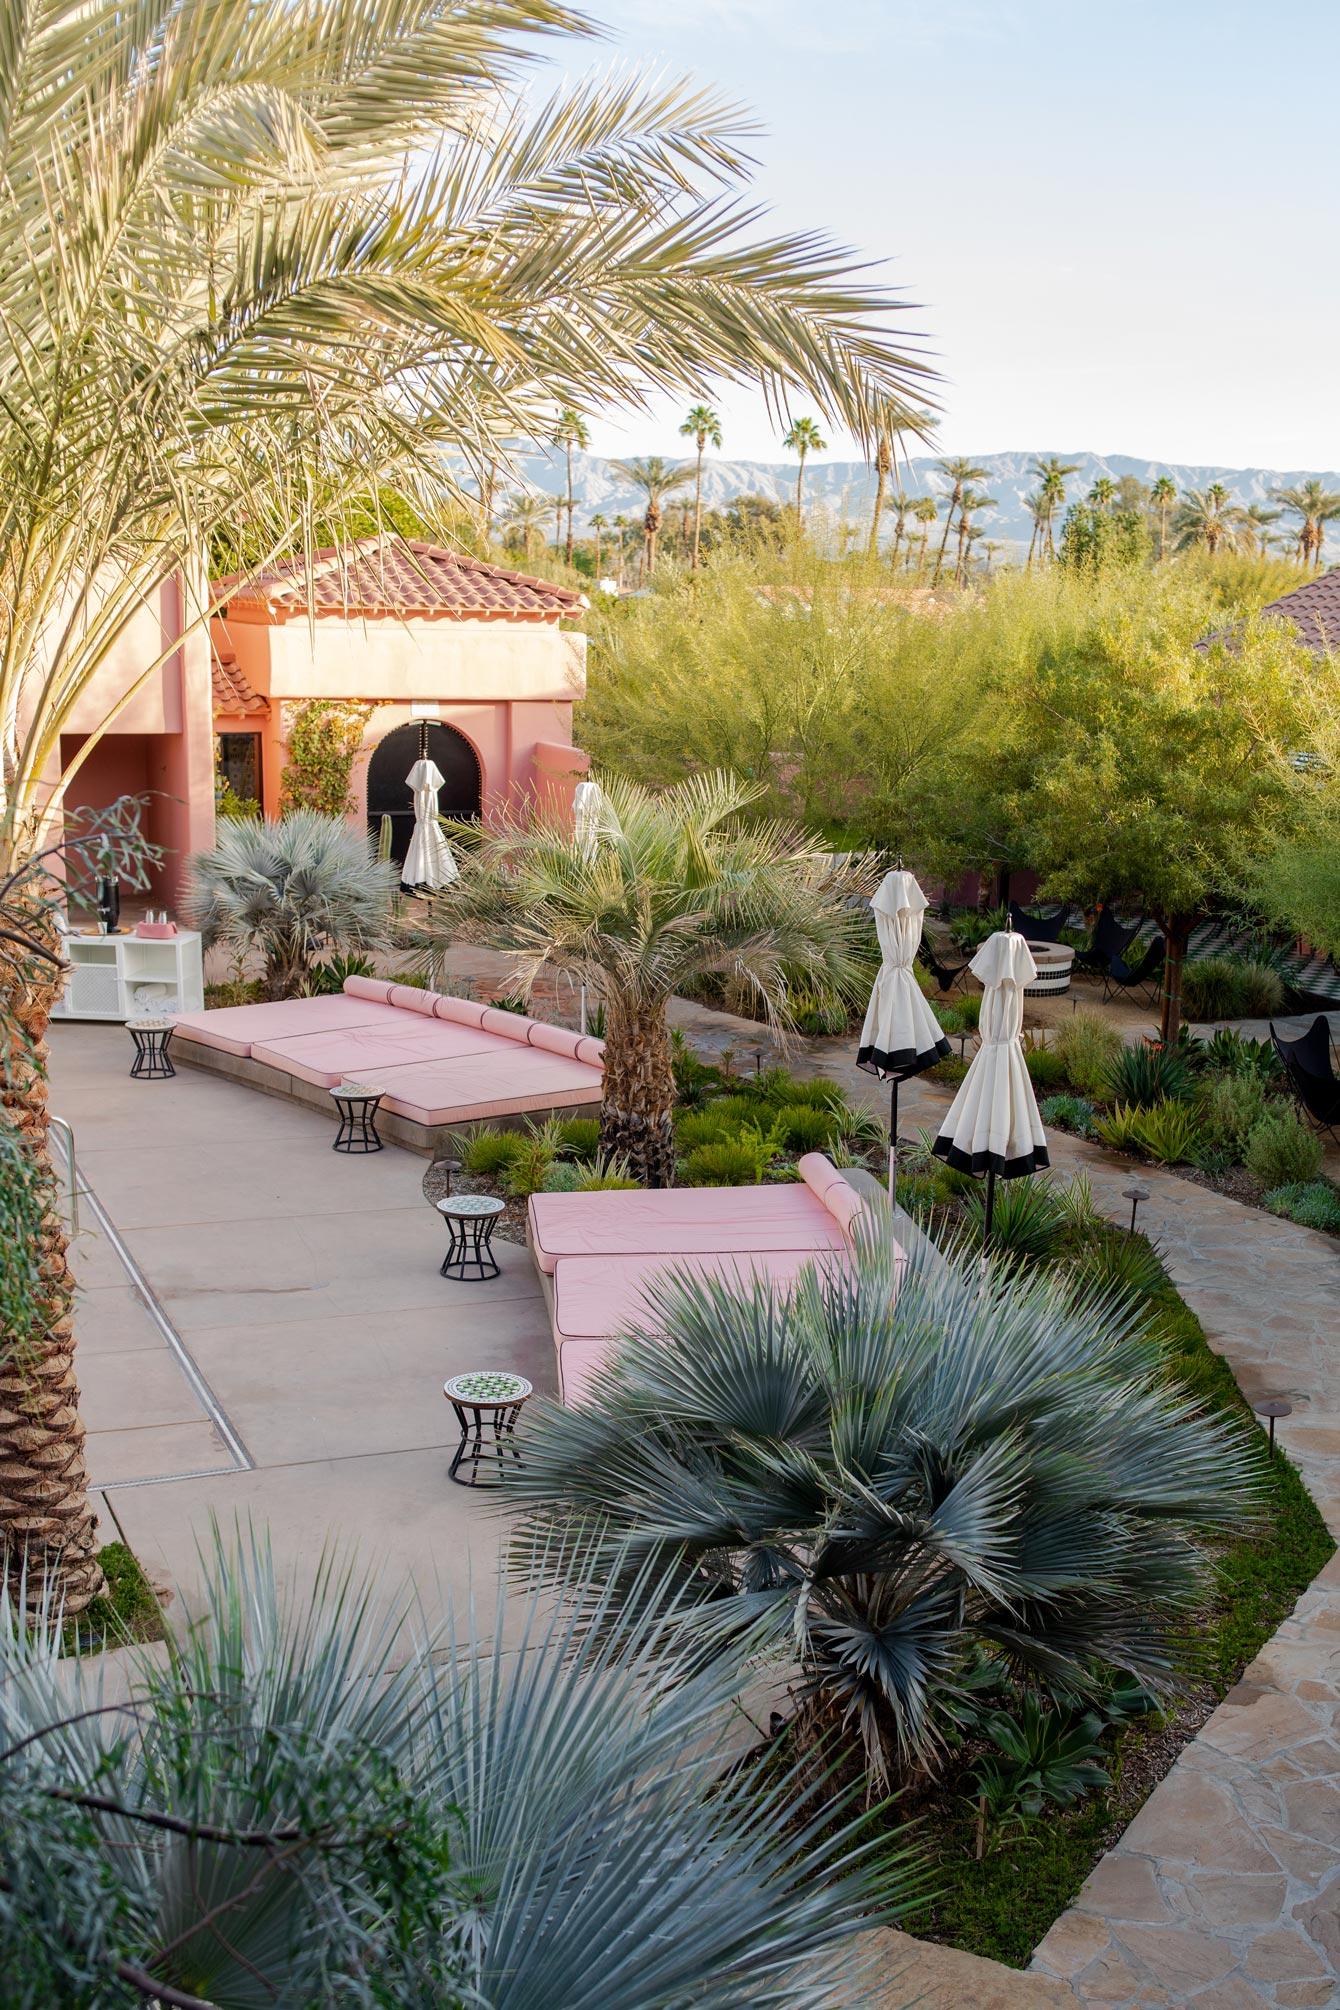 Sands Hotel Palm Desert